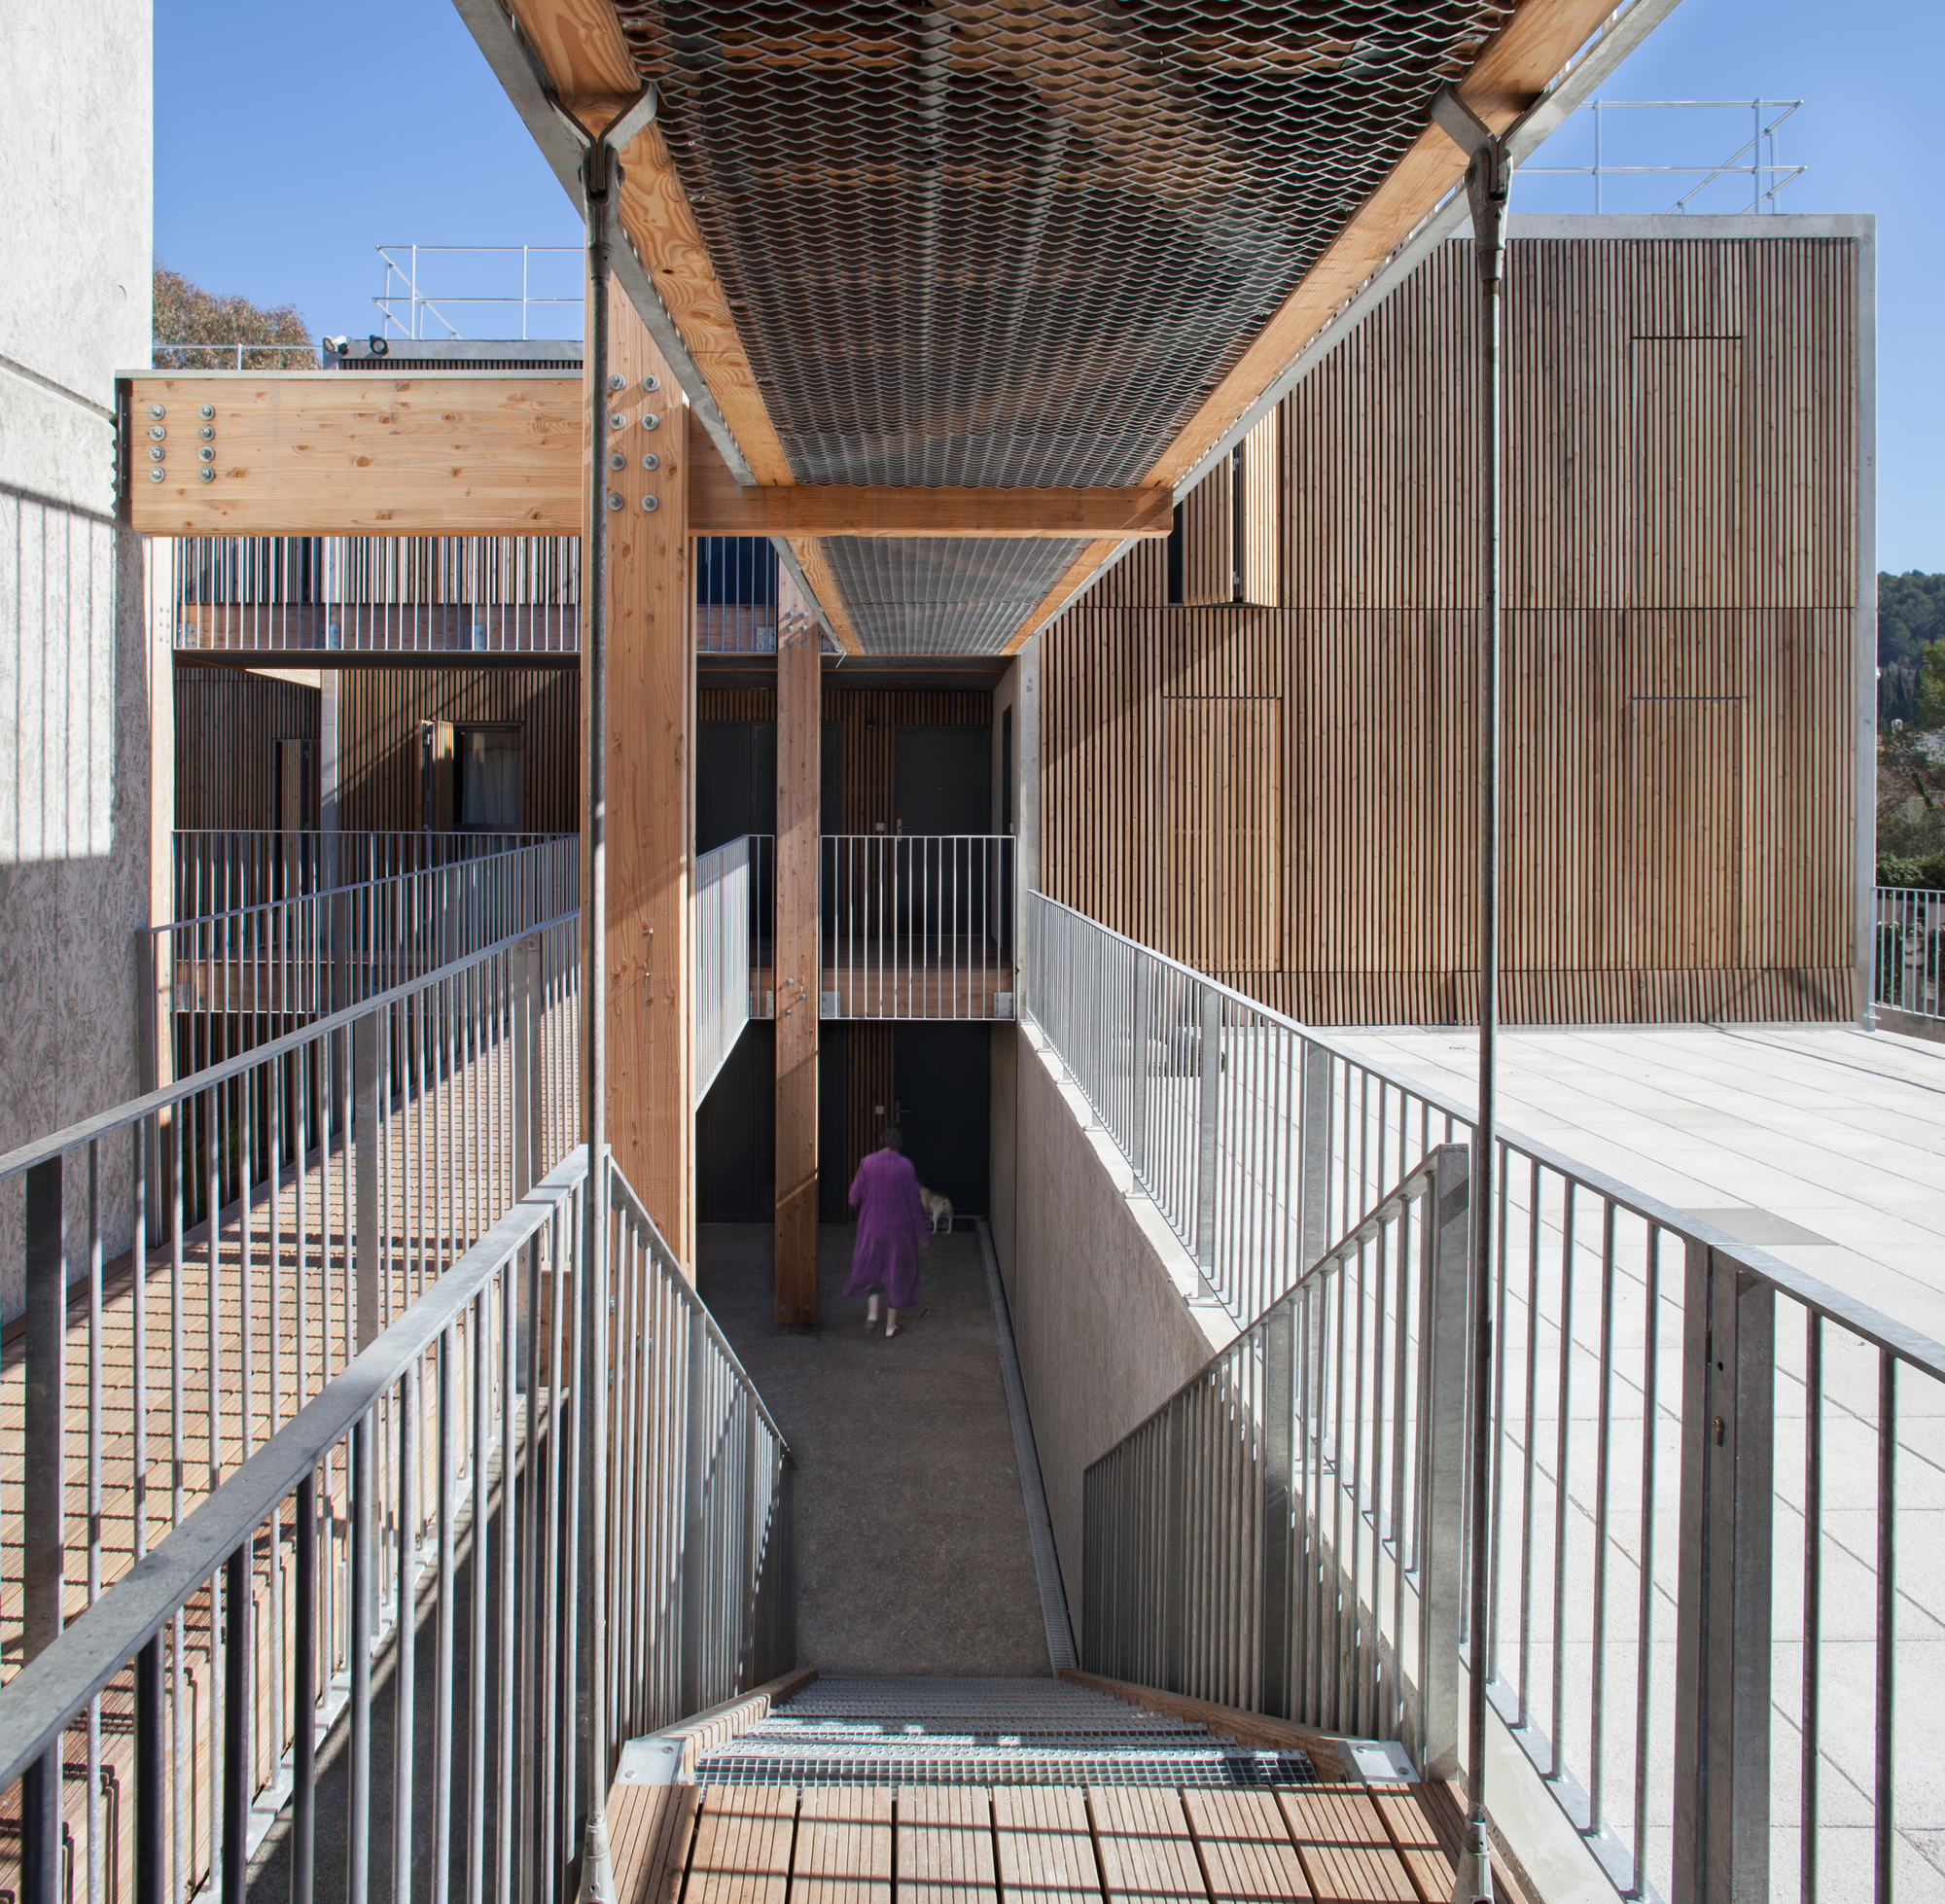 gallery of social housing shops in mouans sartoux comte et vollenweider architectes 3. Black Bedroom Furniture Sets. Home Design Ideas